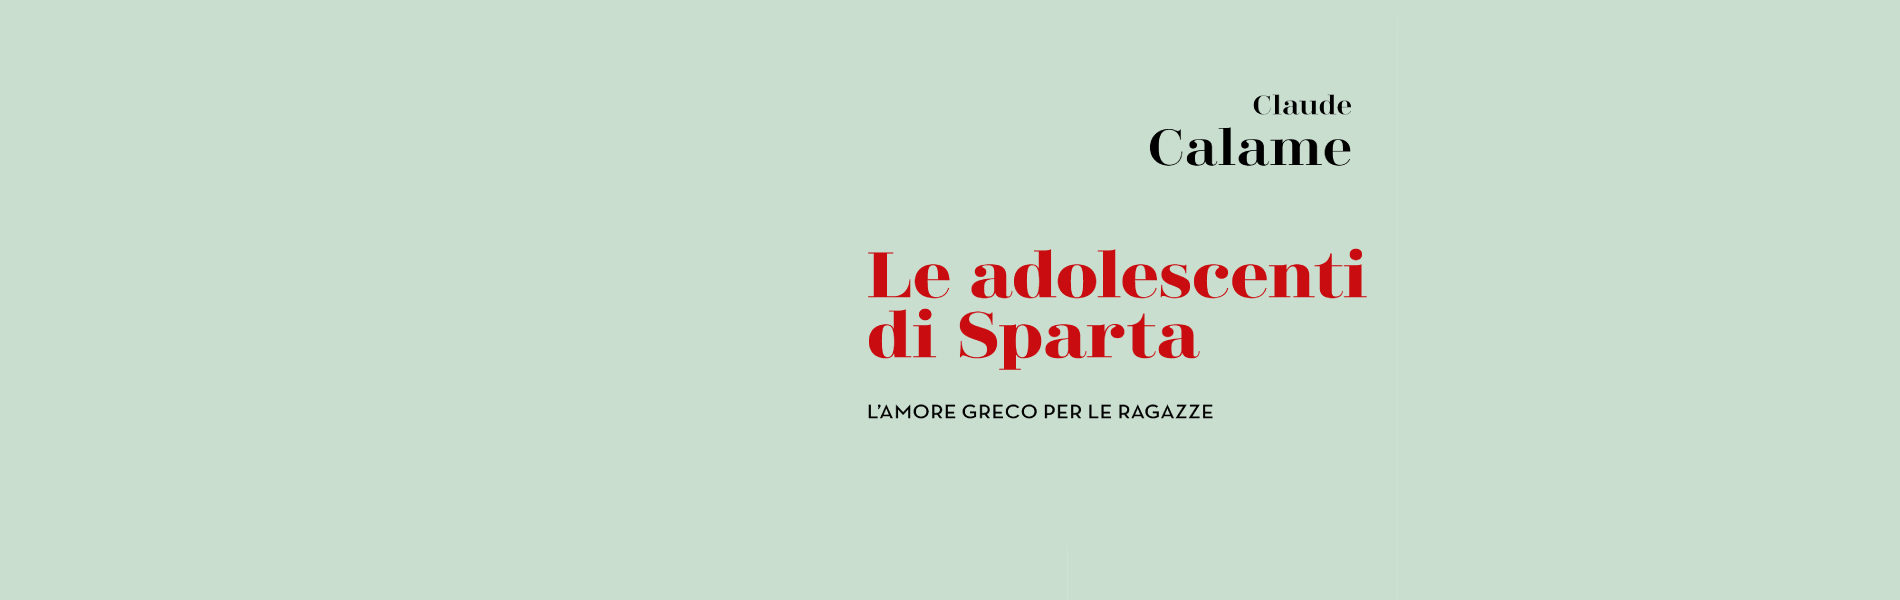 Cover Home_Claude Calame